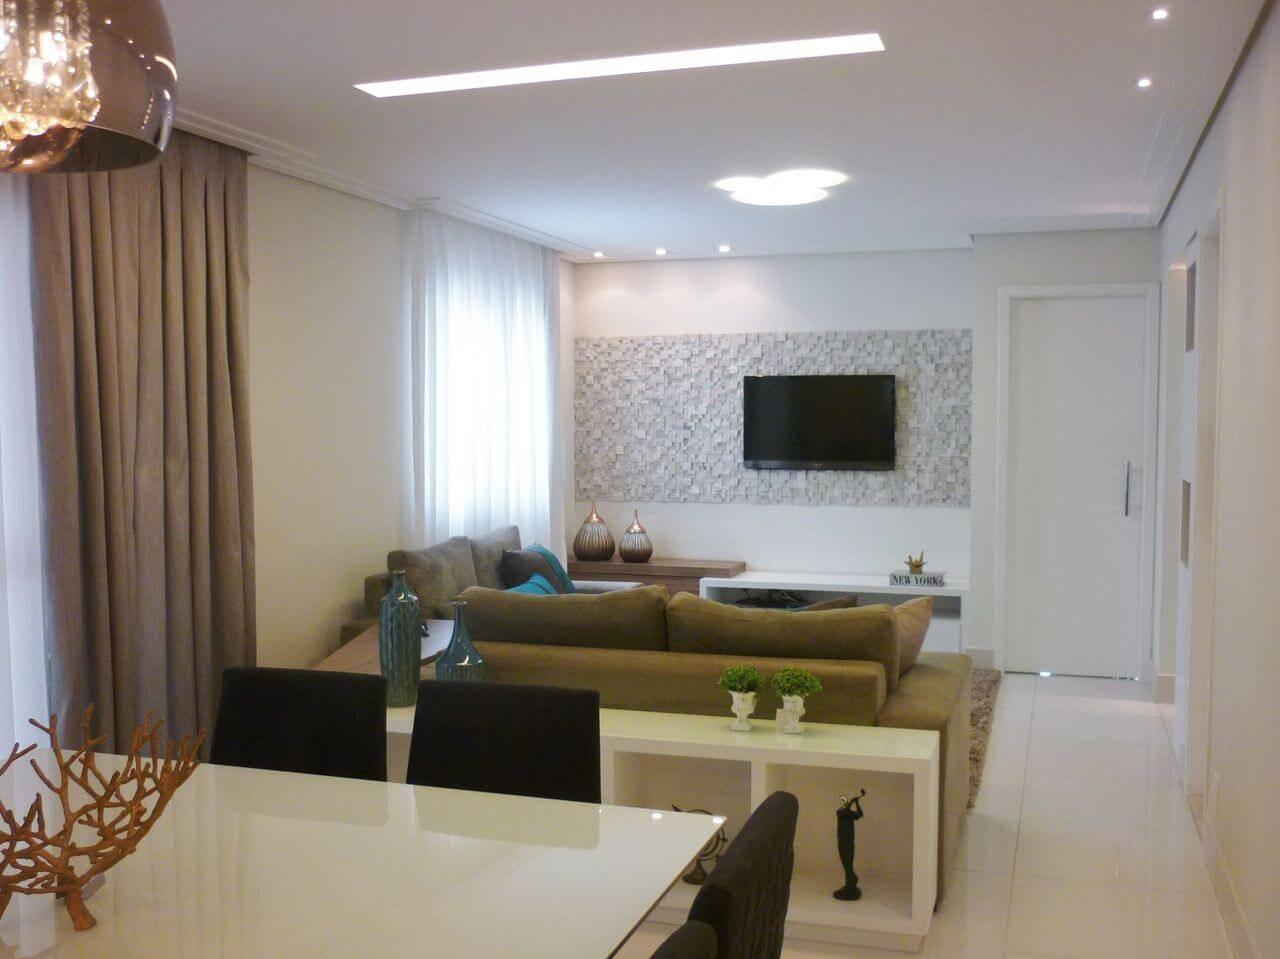 revestimento 3d sala de estar com pastilhas andrea del monaco 127986